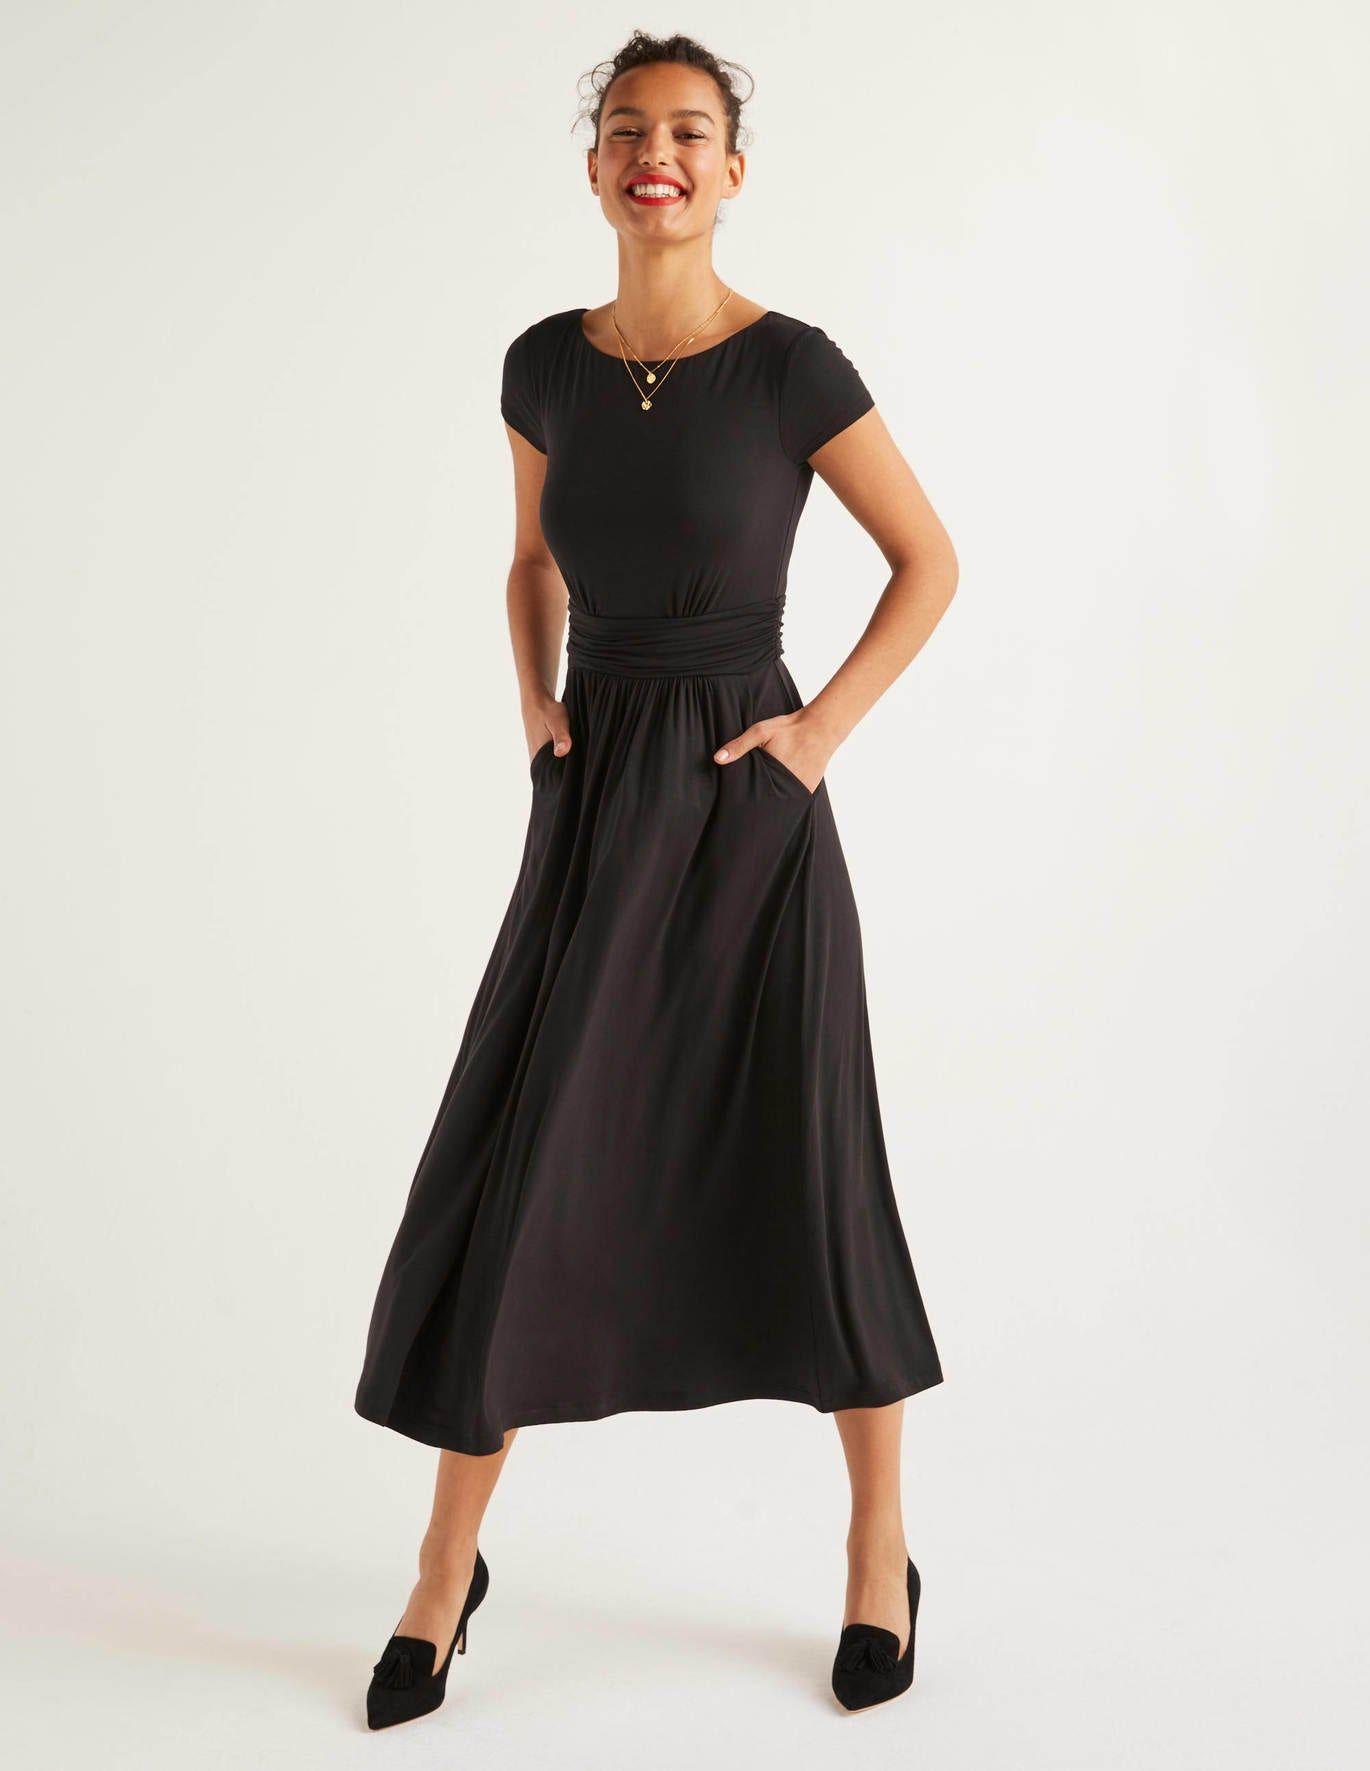 Faye Jersey Midi Dress Navy Boden Au Black Midi Dress Navy Midi Dress Elegant Midi Dresses [ 1771 x 1370 Pixel ]